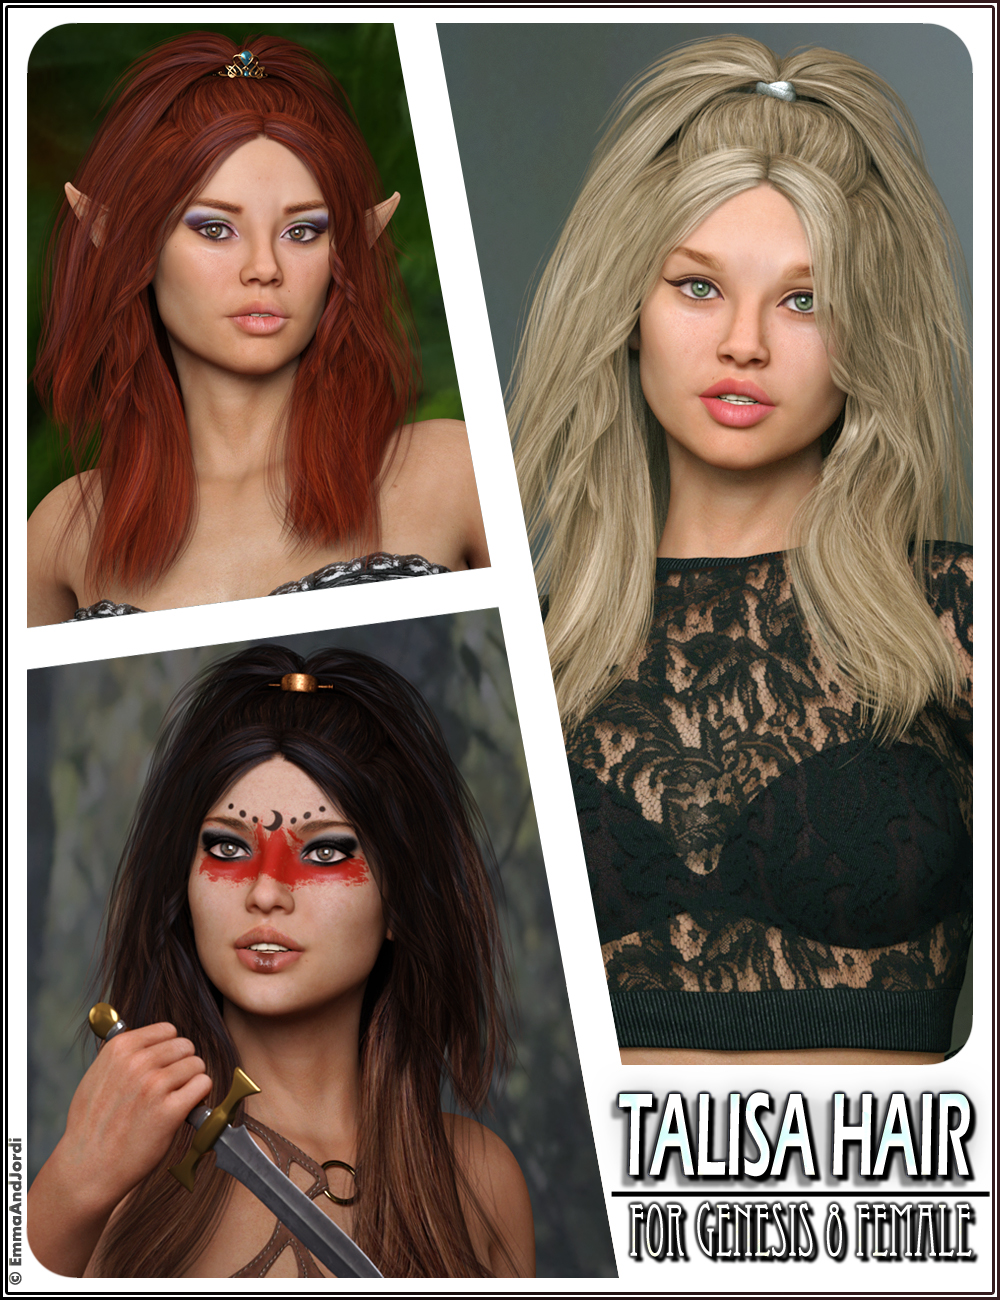 Talisa Hair for Genesis 8 Female(s) by: EmmaAndJordi, 3D Models by Daz 3D